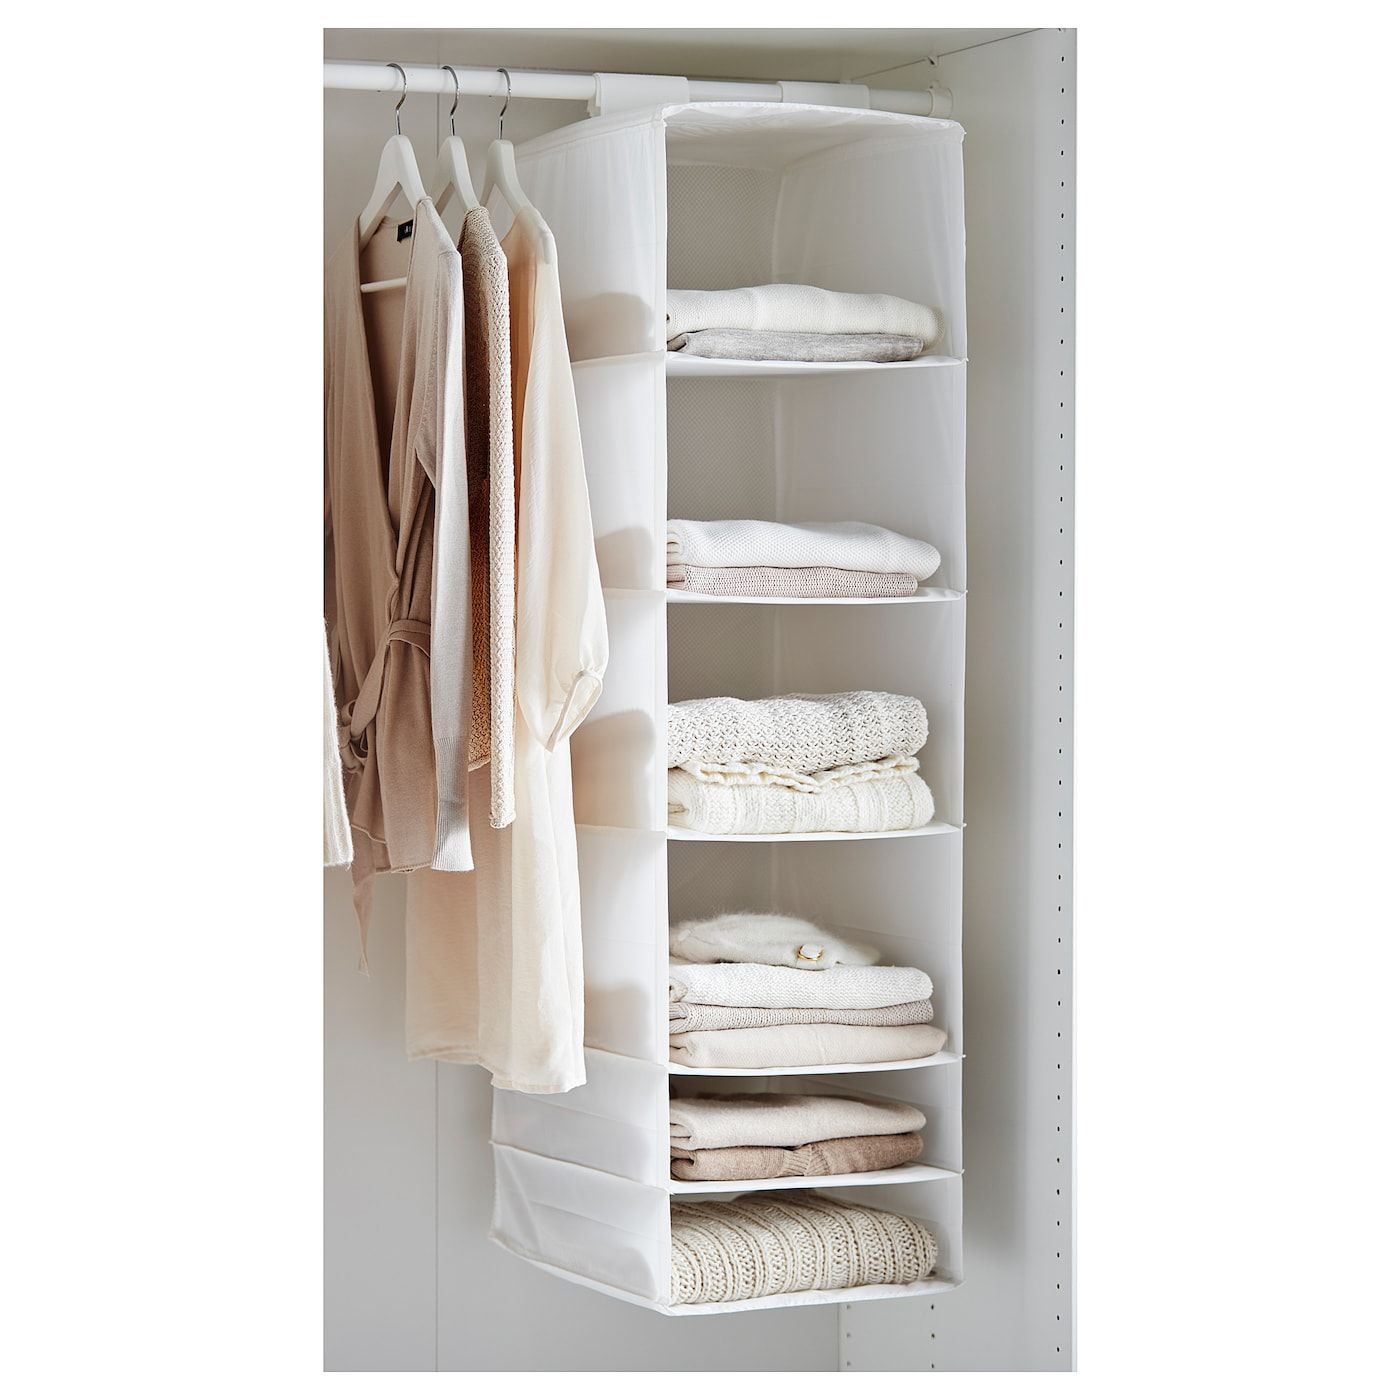 Ikea Skubb Organizer With 6 Compartments Closet Organizer Plans